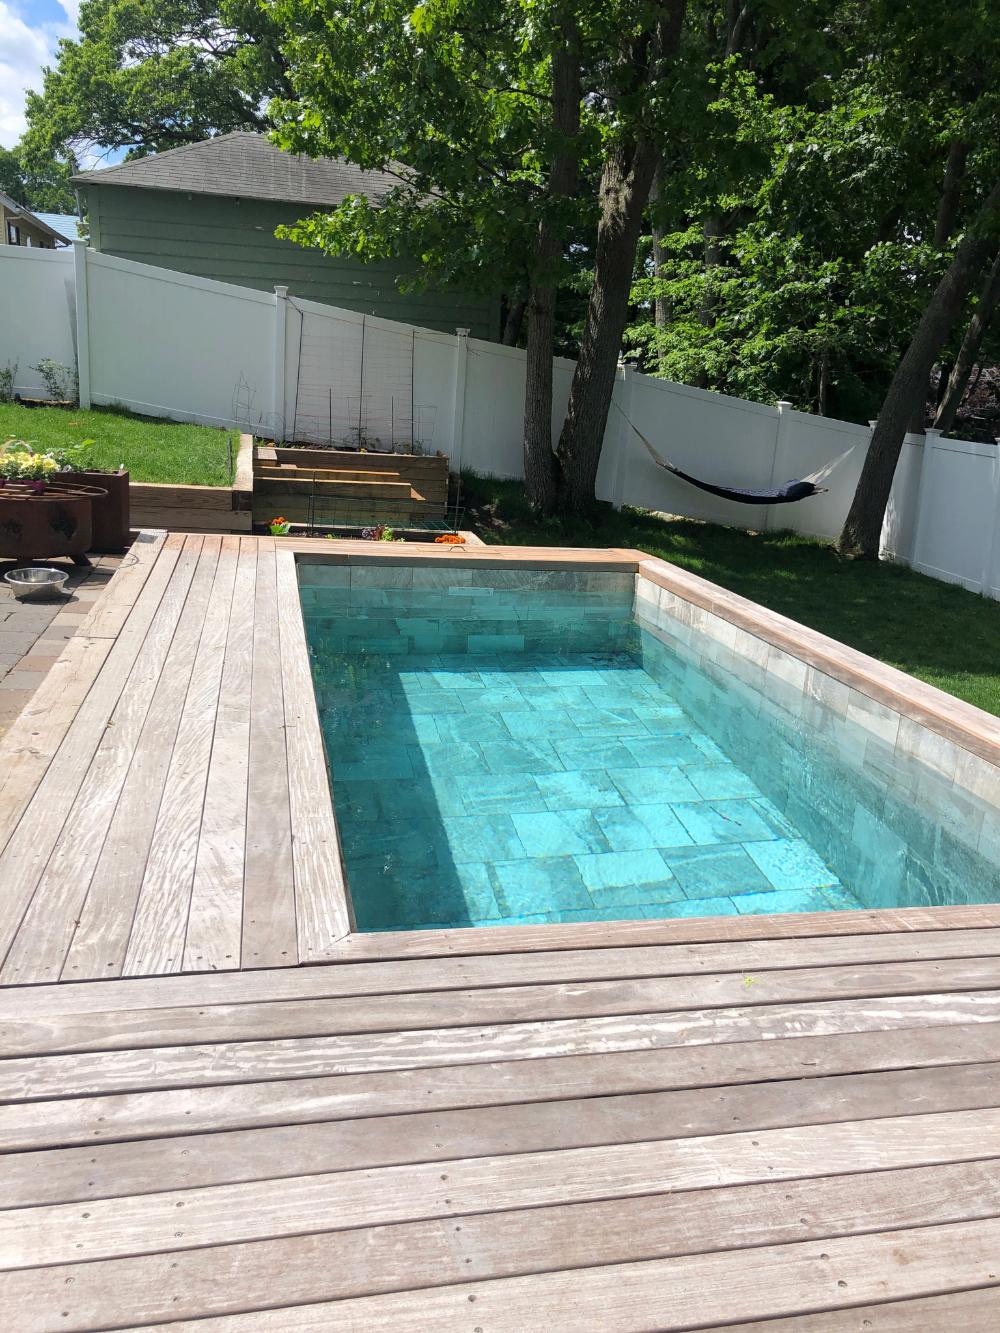 Gallery Soake Pools Small Swimming Pools Small Backyard Pools Swimming Pool Landscaping